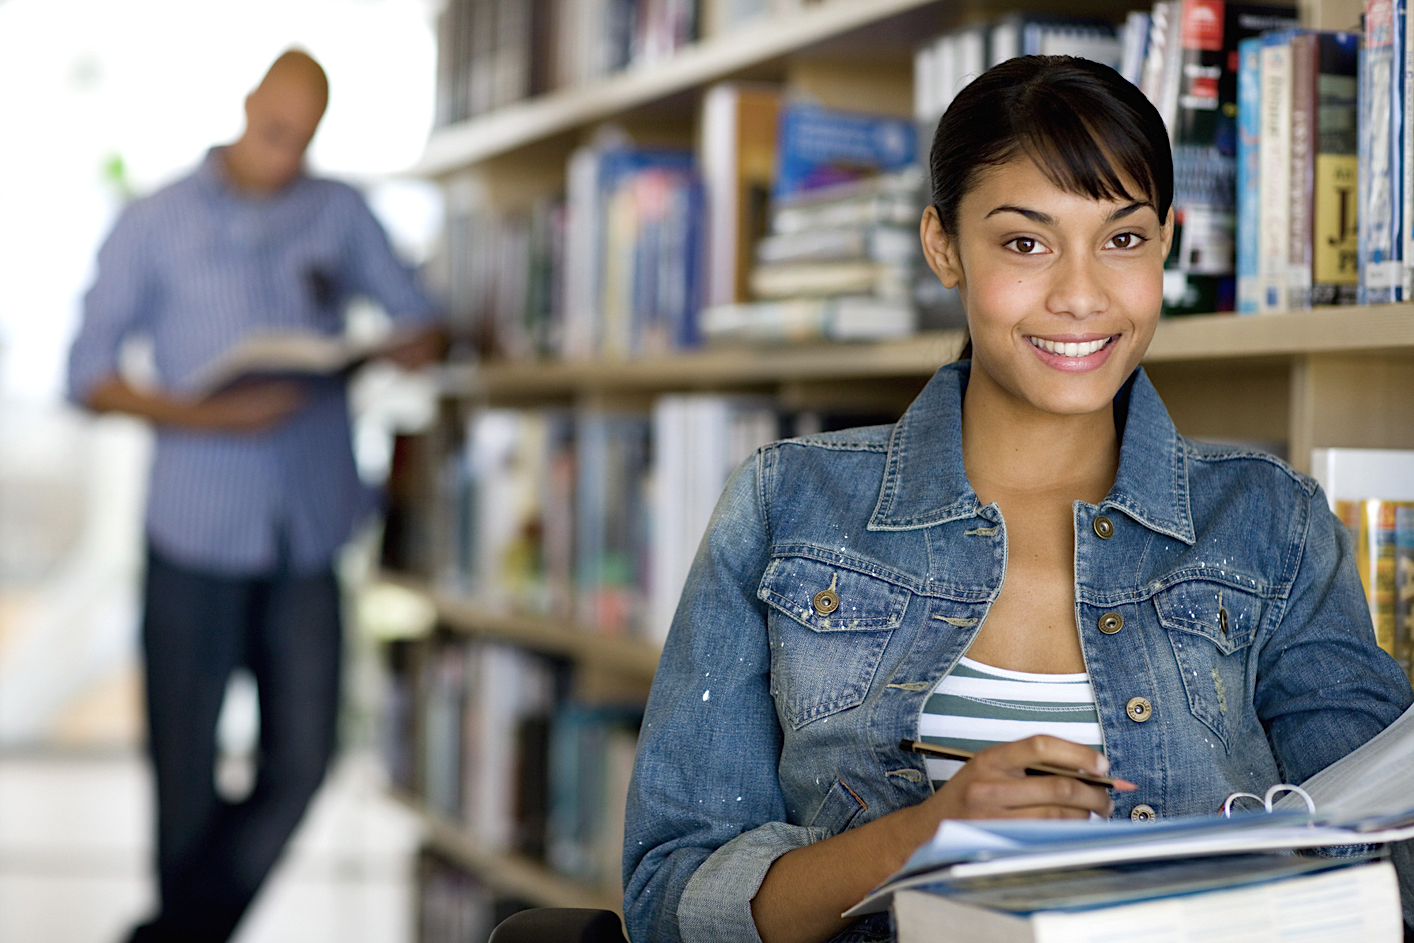 African American News, African American Education, Black Education, HBCU, Historically Black College and University, KOLUMN Magazine, KOLUMN, KINDR'D Magazine, KINDR'D